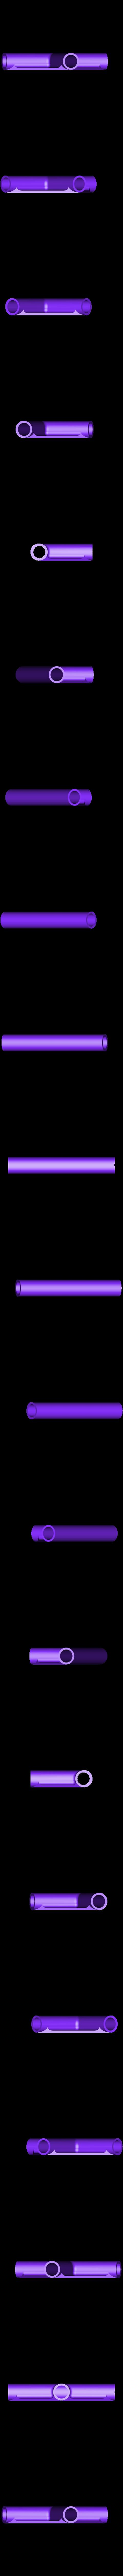 raccord T 3tubes plat glissant.stl Download free STL file Pipe brackets dia 12 • 3D printing model, mk25